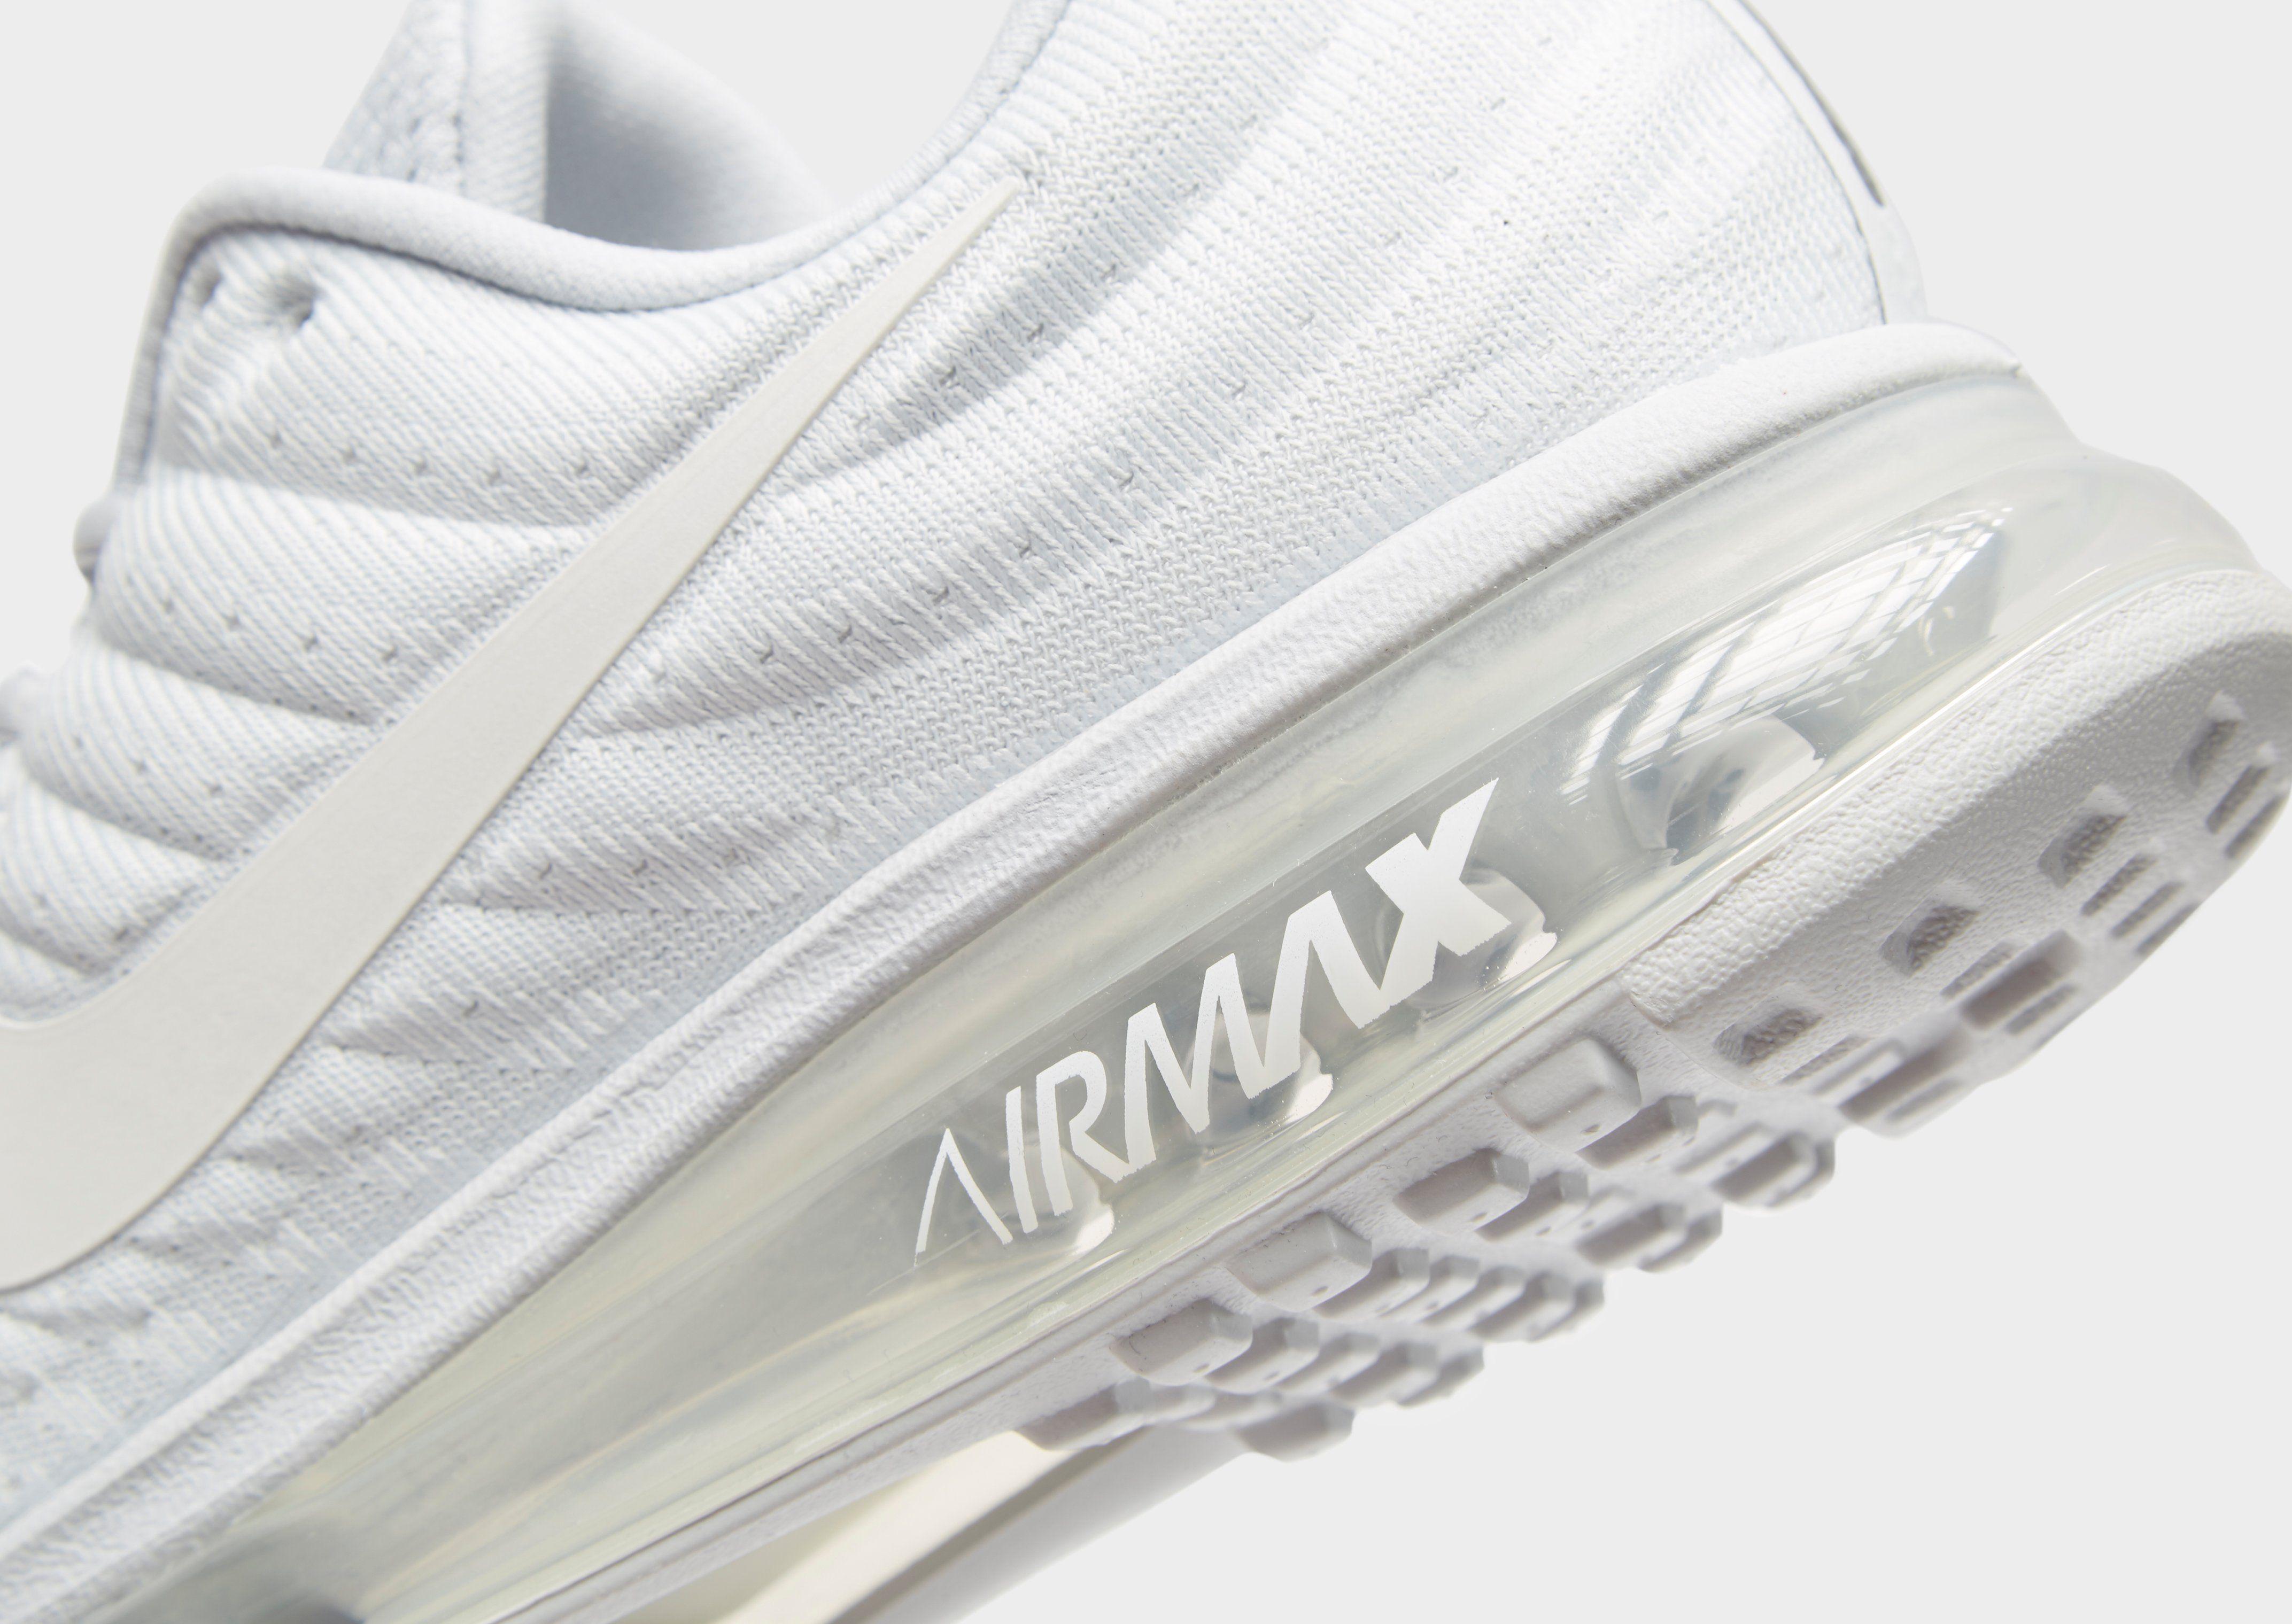 Nike Air Max 2017 Weiss Ausverkaufspreise Rabatt Großhandel Rabatt Neue Ankunft OmjzbJ